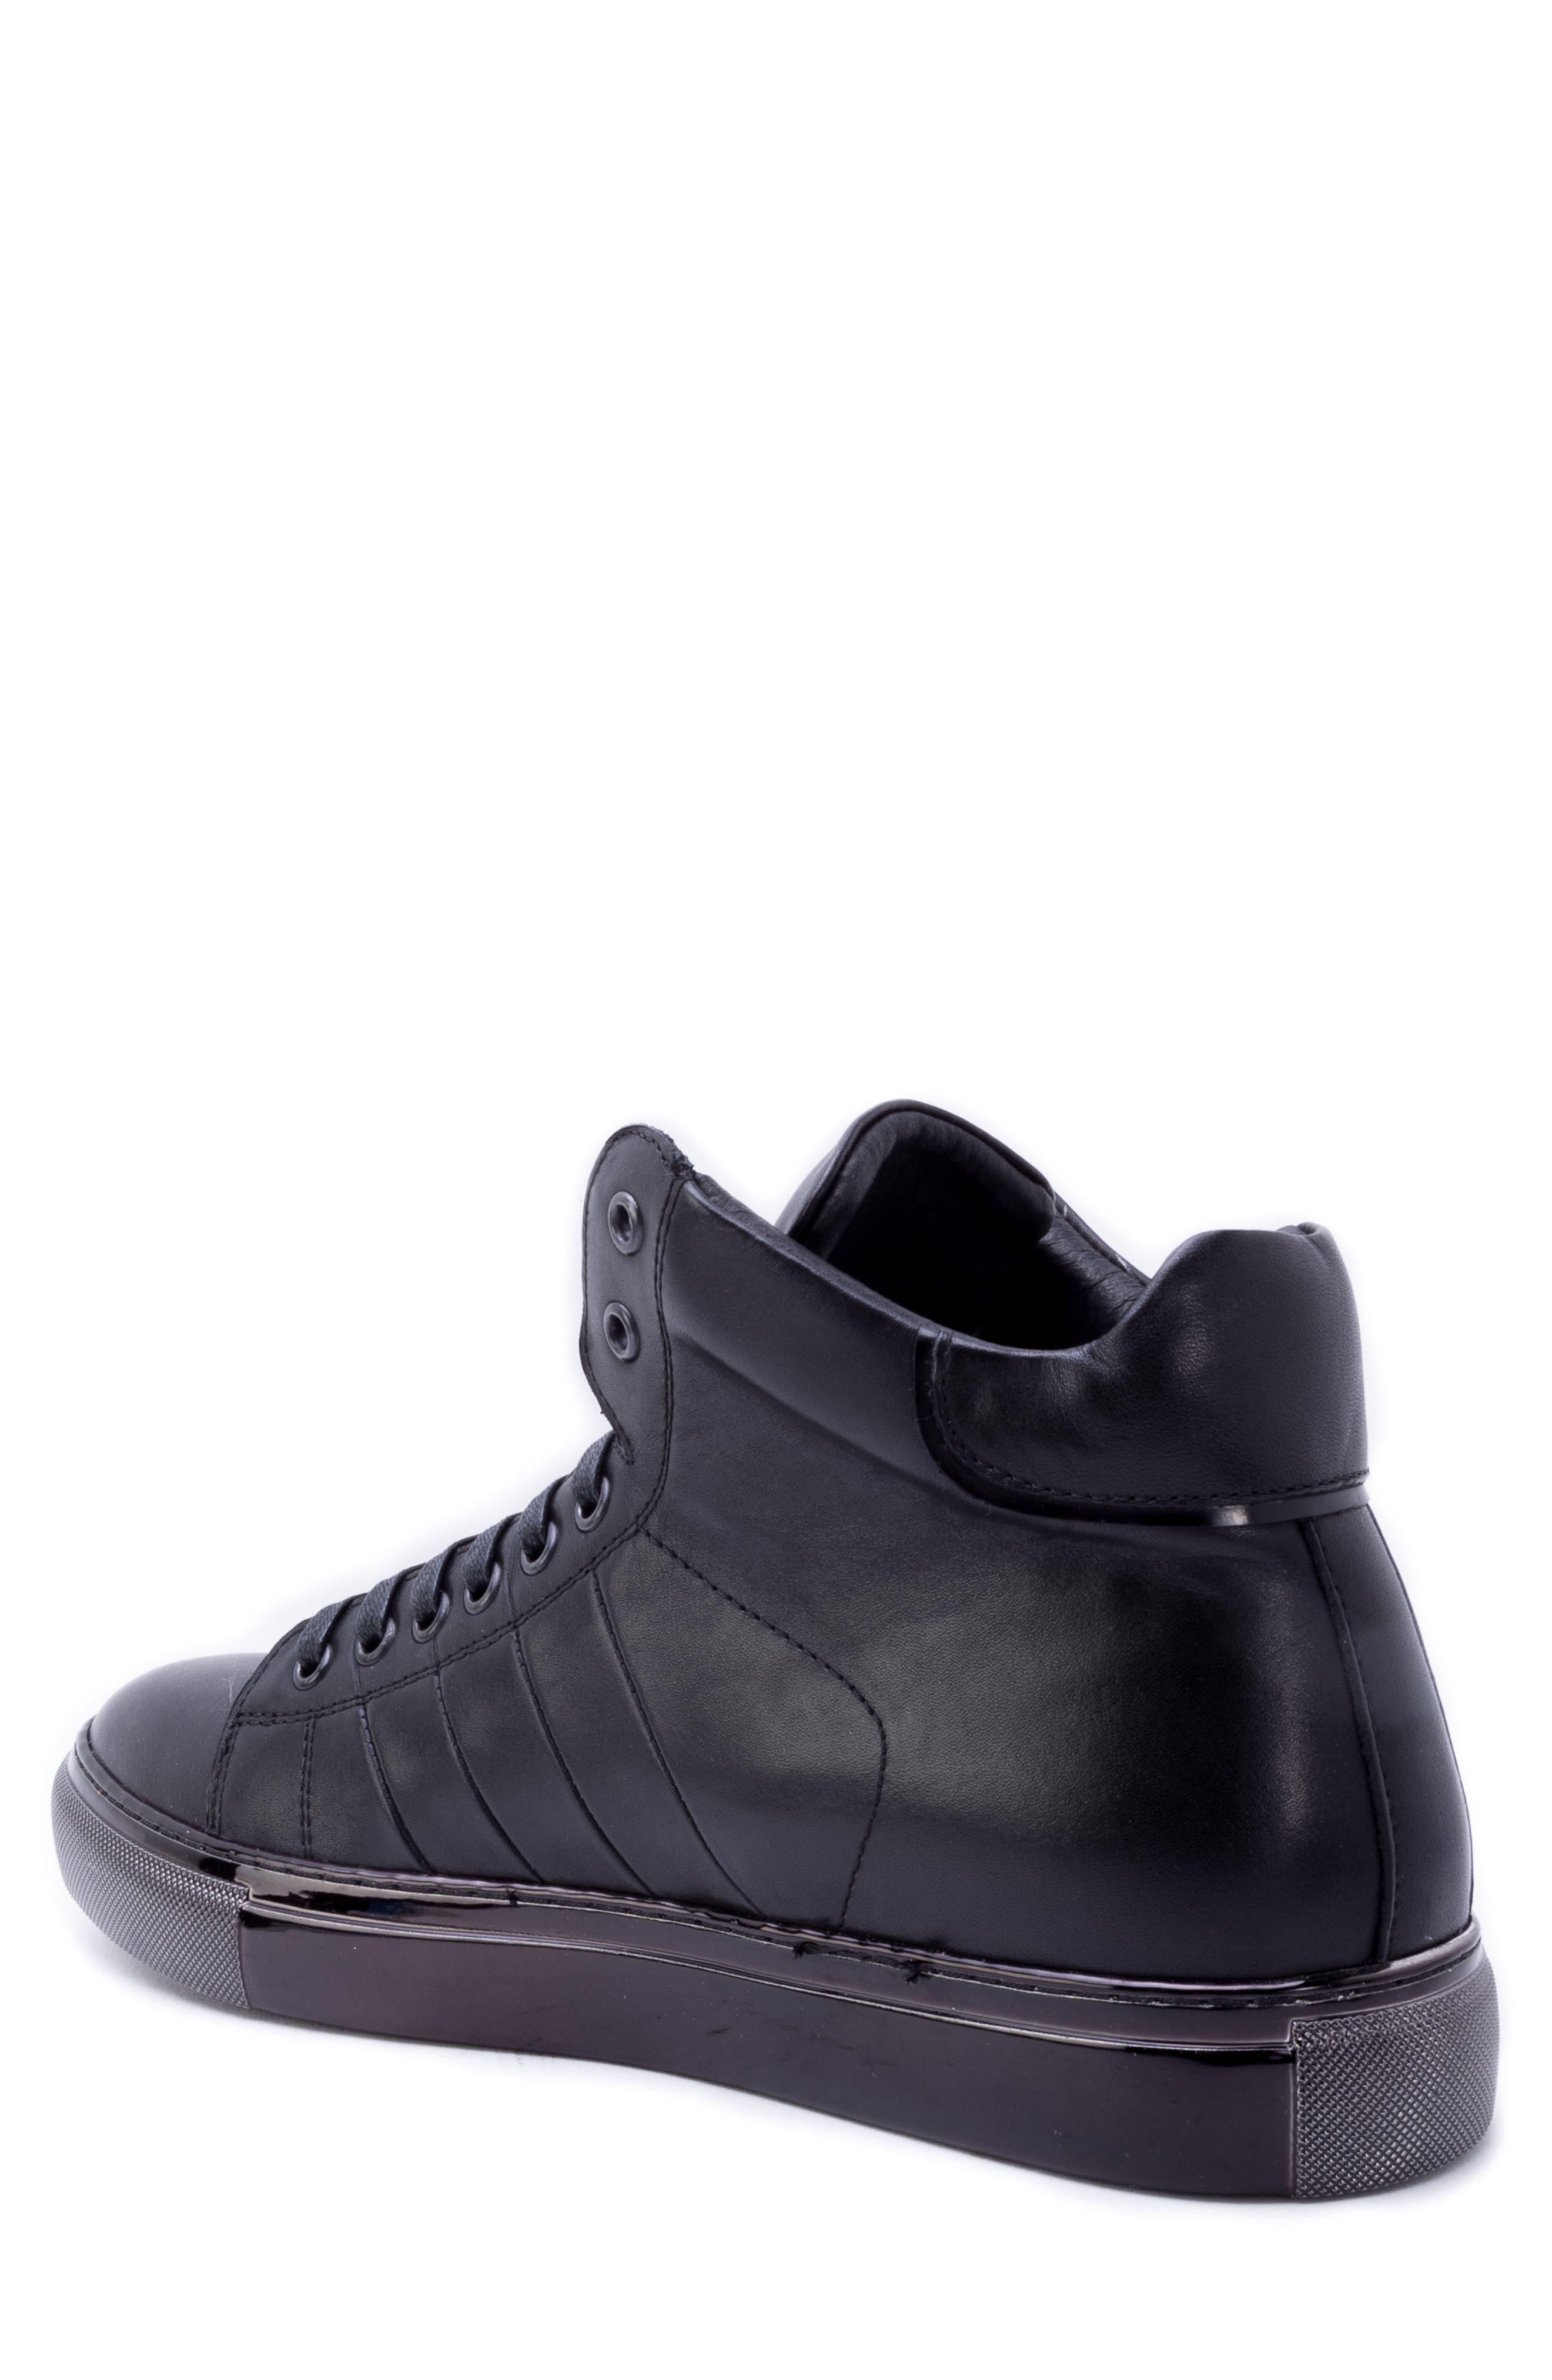 Crosby Sneaker,                             Alternate thumbnail 2, color,                             BLACK LEATHER